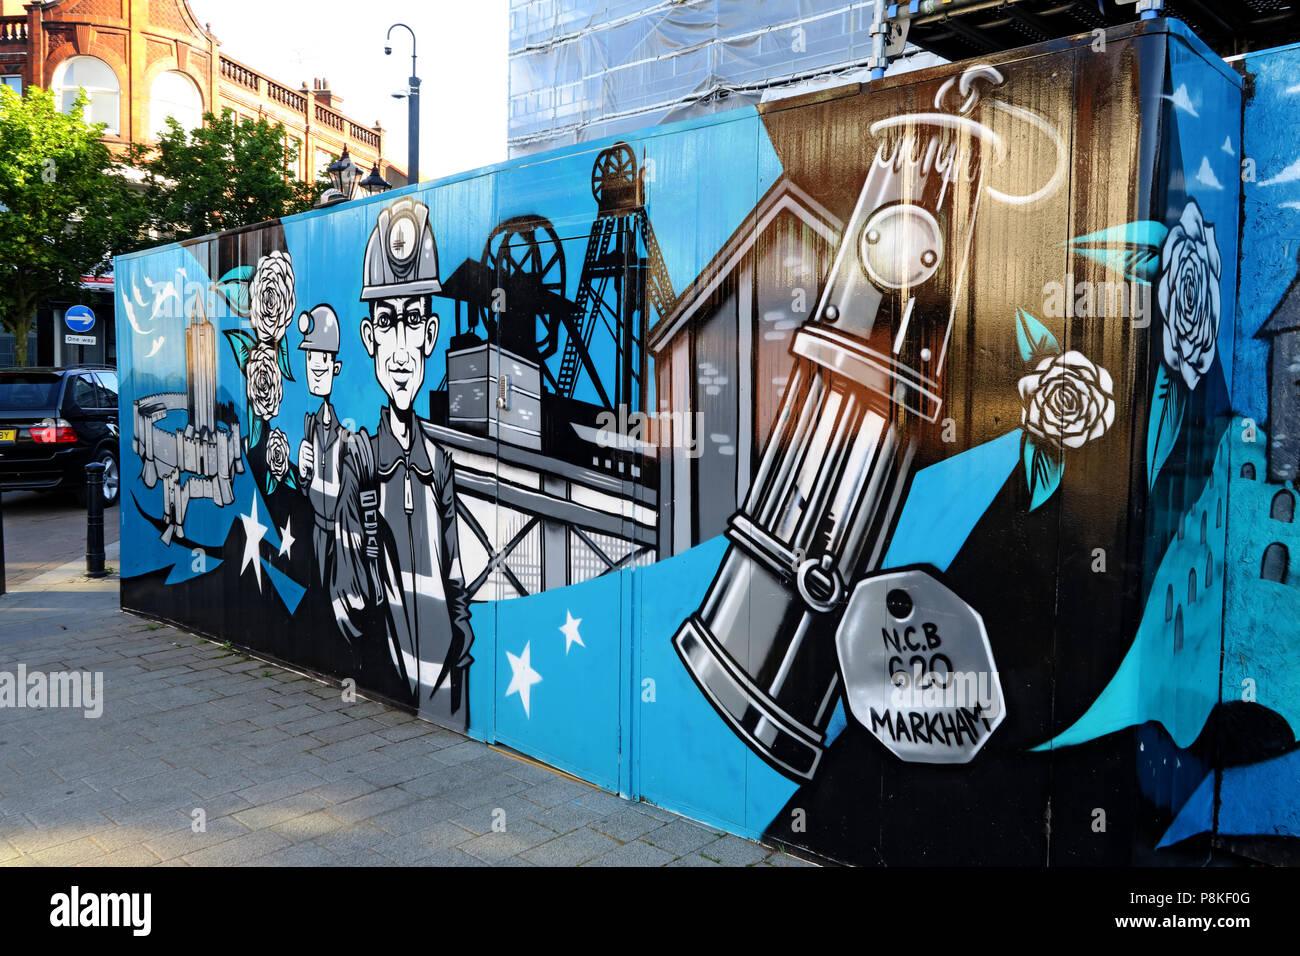 @HotpixUK,GoTonySmith,South Yorkshire,Yorkshire,England,Donny,Doncaster Yorkshire,town,town centre,shop,shops,retail,Doncaster Town Centre,Danum,Roman Danum,DN1,DN1 Postcode,Metropolitan Borough Doncaster,Doncaster Borough Council,council,Doncaster town,voted leave,EU Referendum,art,graffiti,artwork,urban,heritage,history,Doncaster Market,redevelopment,improvement,plan,historic Wool Market,historic,Sheffield City Region SCRIF funding,Sheffield City Region funding,SCRIF,Doncaster,Metropolitan Borough of Doncaster